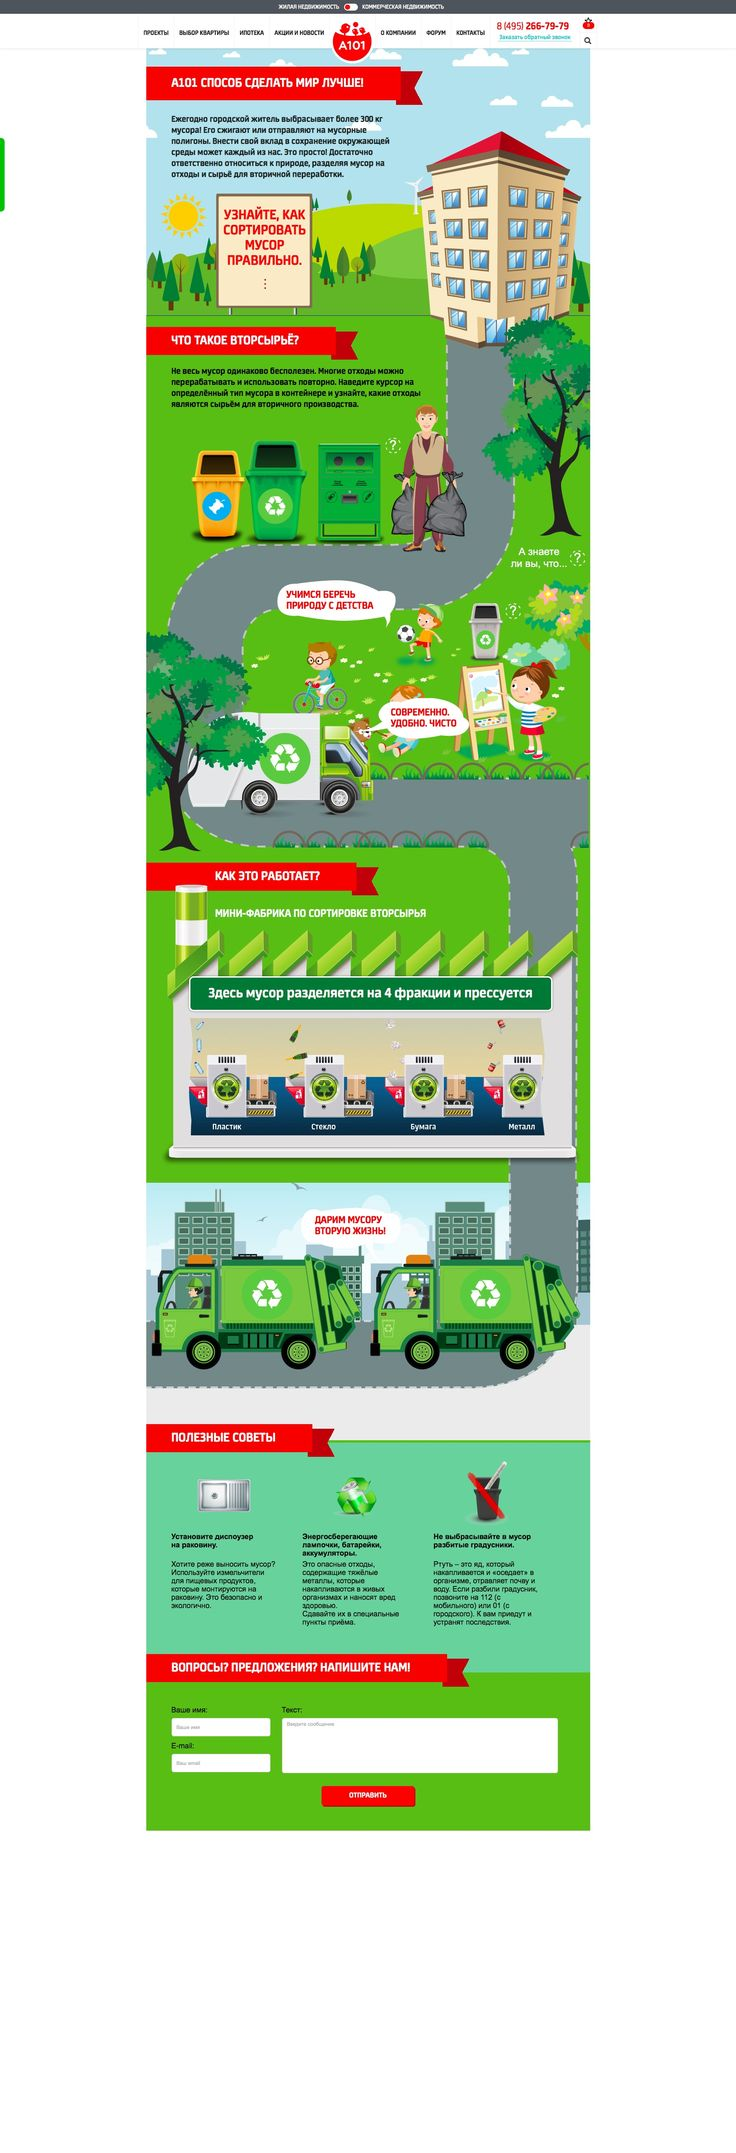 A101: Careful attitude to rubbish is very important. We can give rubbish the second life and help our planet. // A101: Рассказываем об ответственном отношении к окружающей среде и о переработке мусора. #EMAILMATRIX #emailmarketing #landingpage